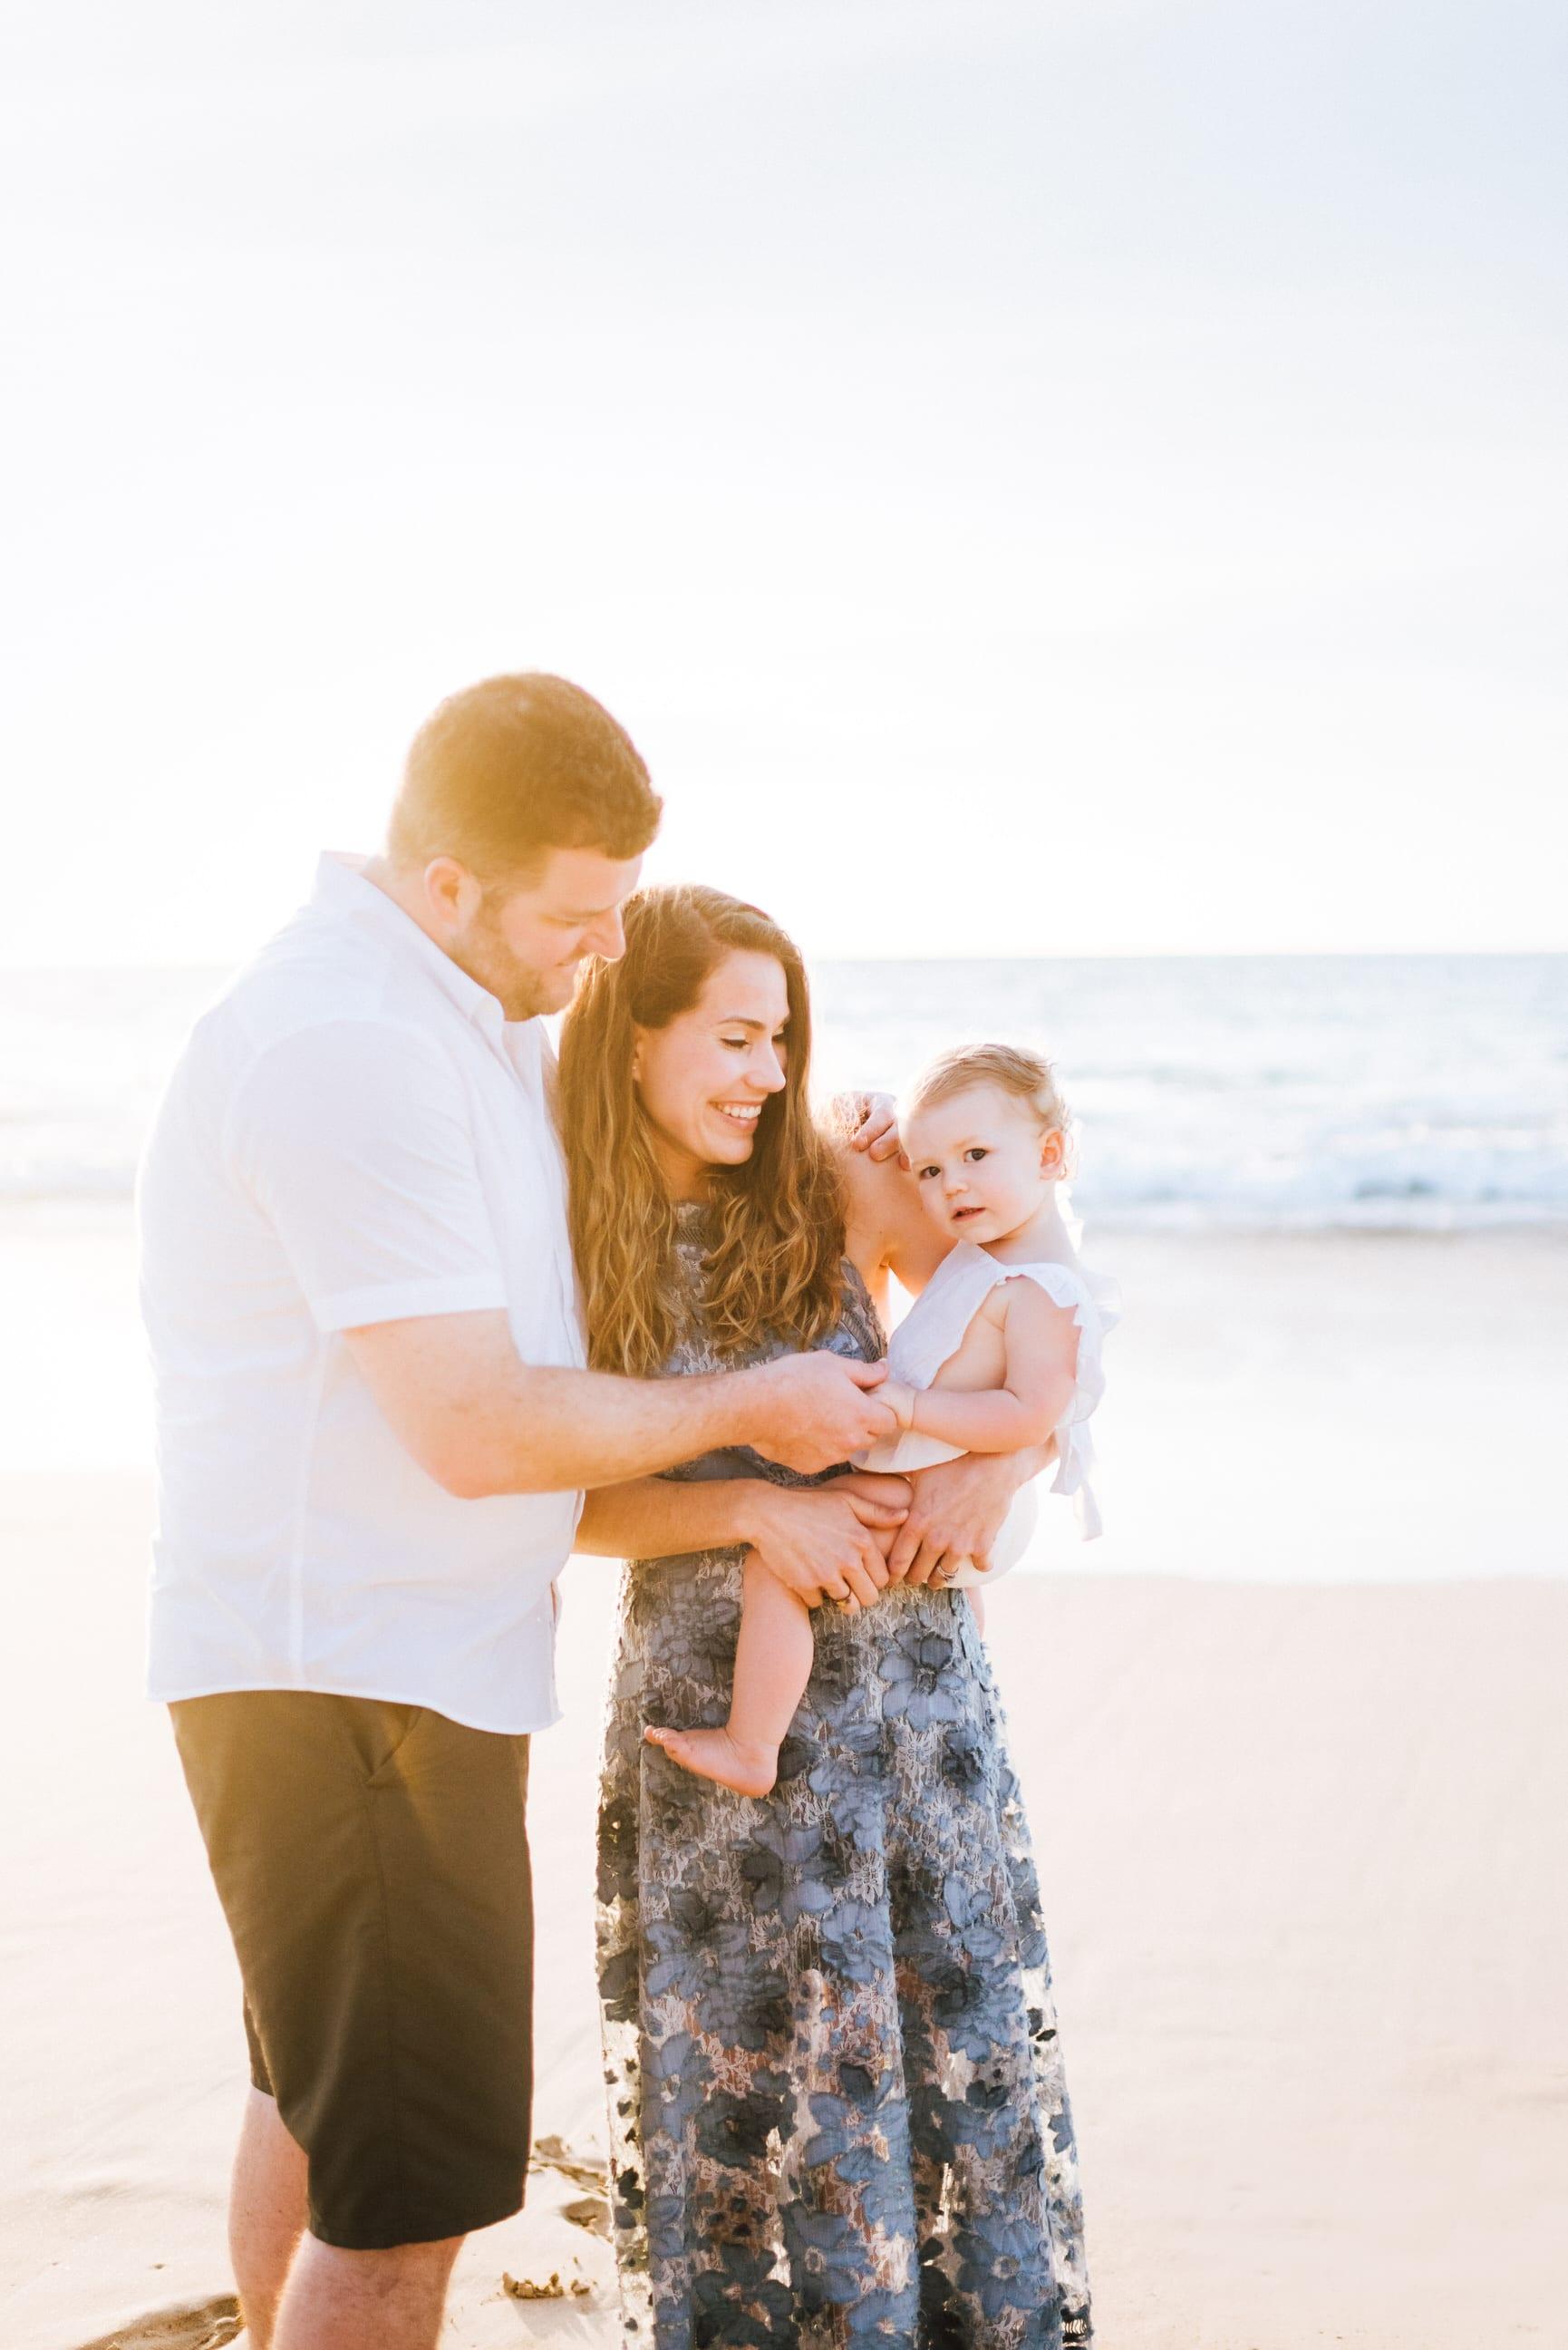 Kona-Photographer-Hawaii-Family-Photos-6.jpg